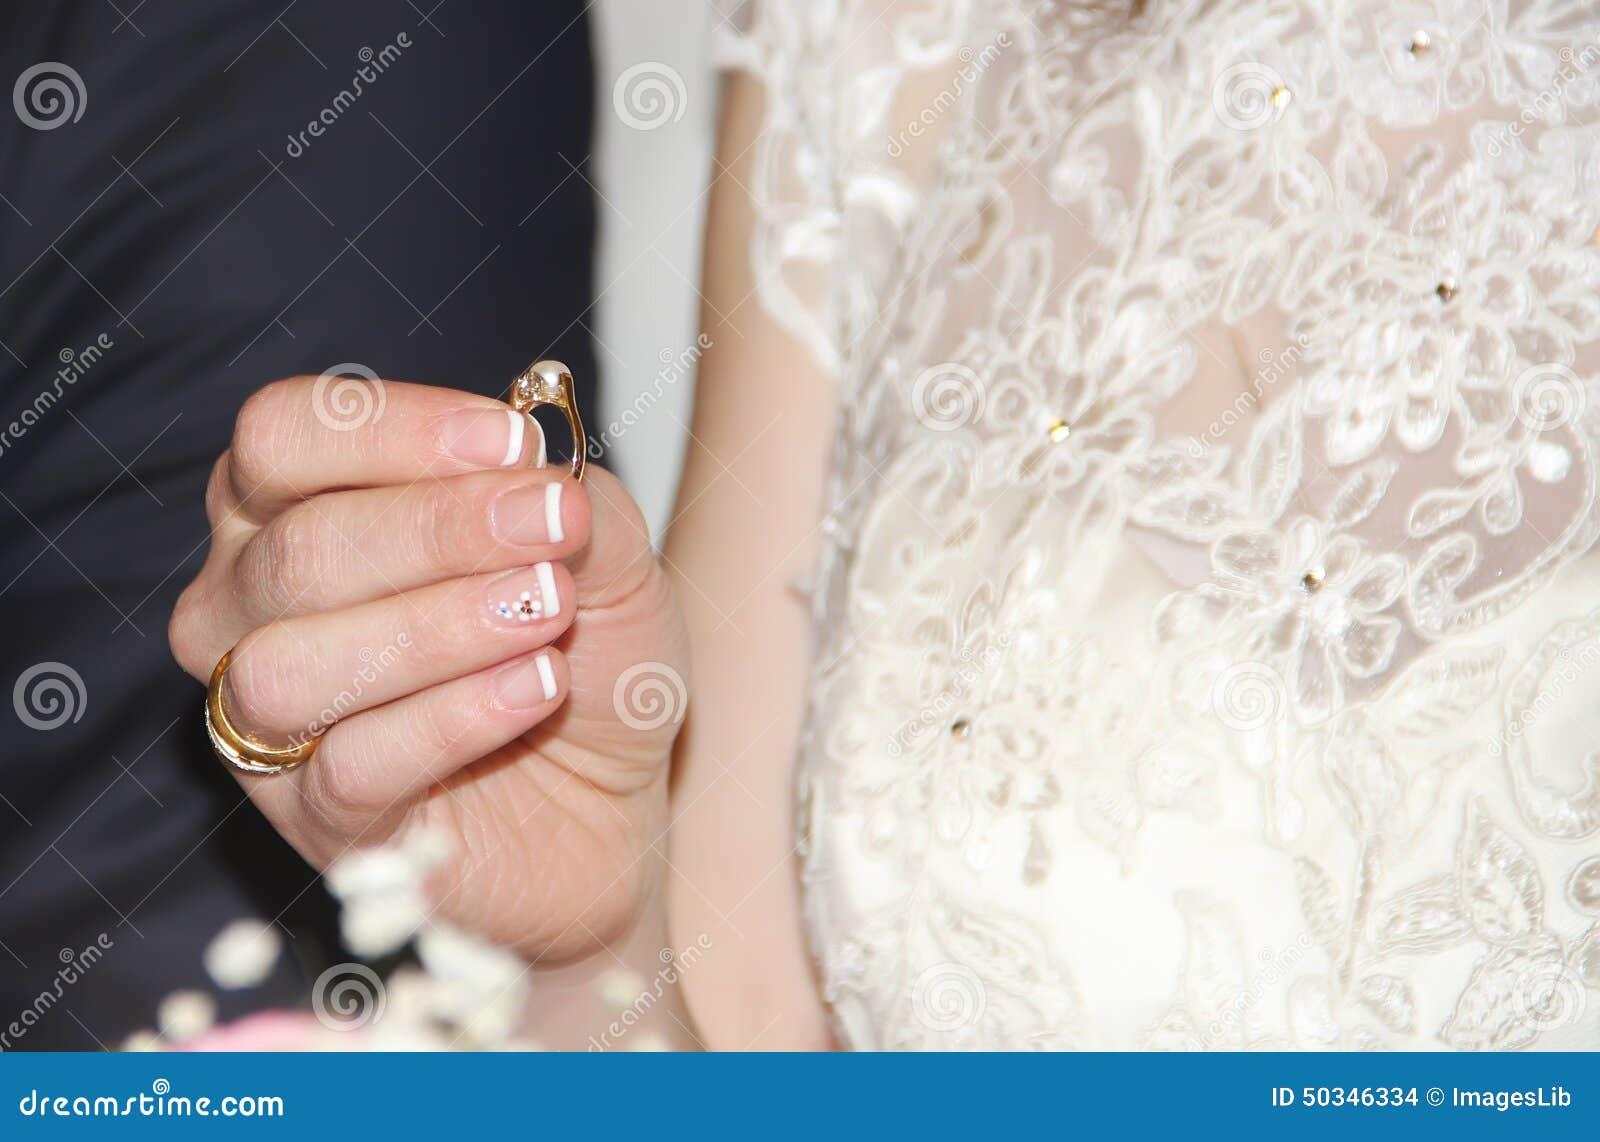 Weddings Ring